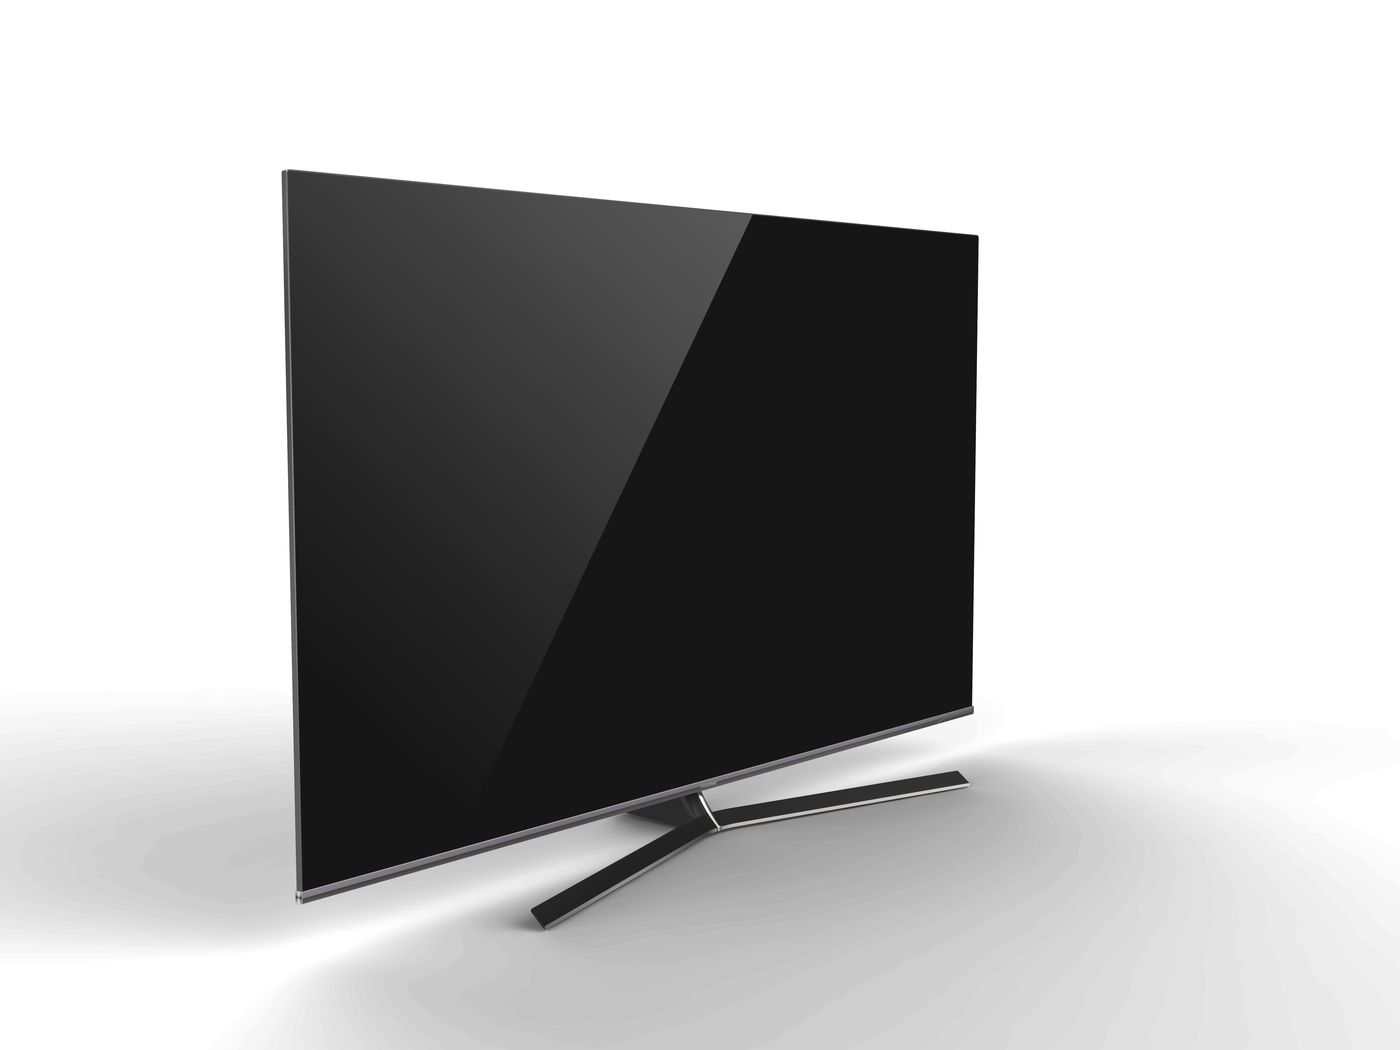 Hisense announces Sonic One TV alongside its new 2019 4K TV